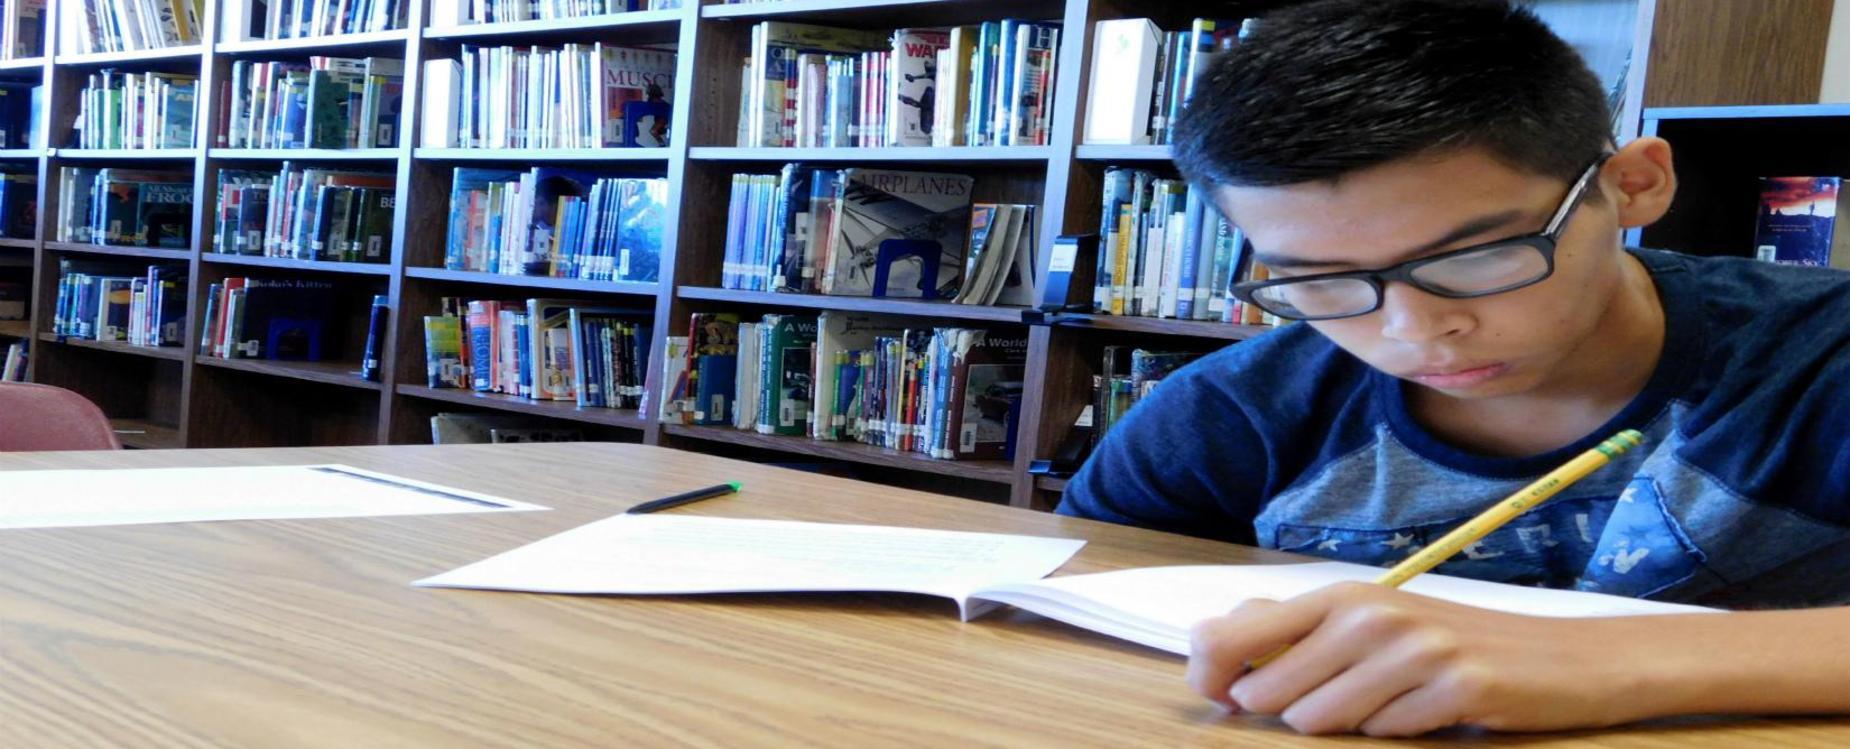 Student focusing on work